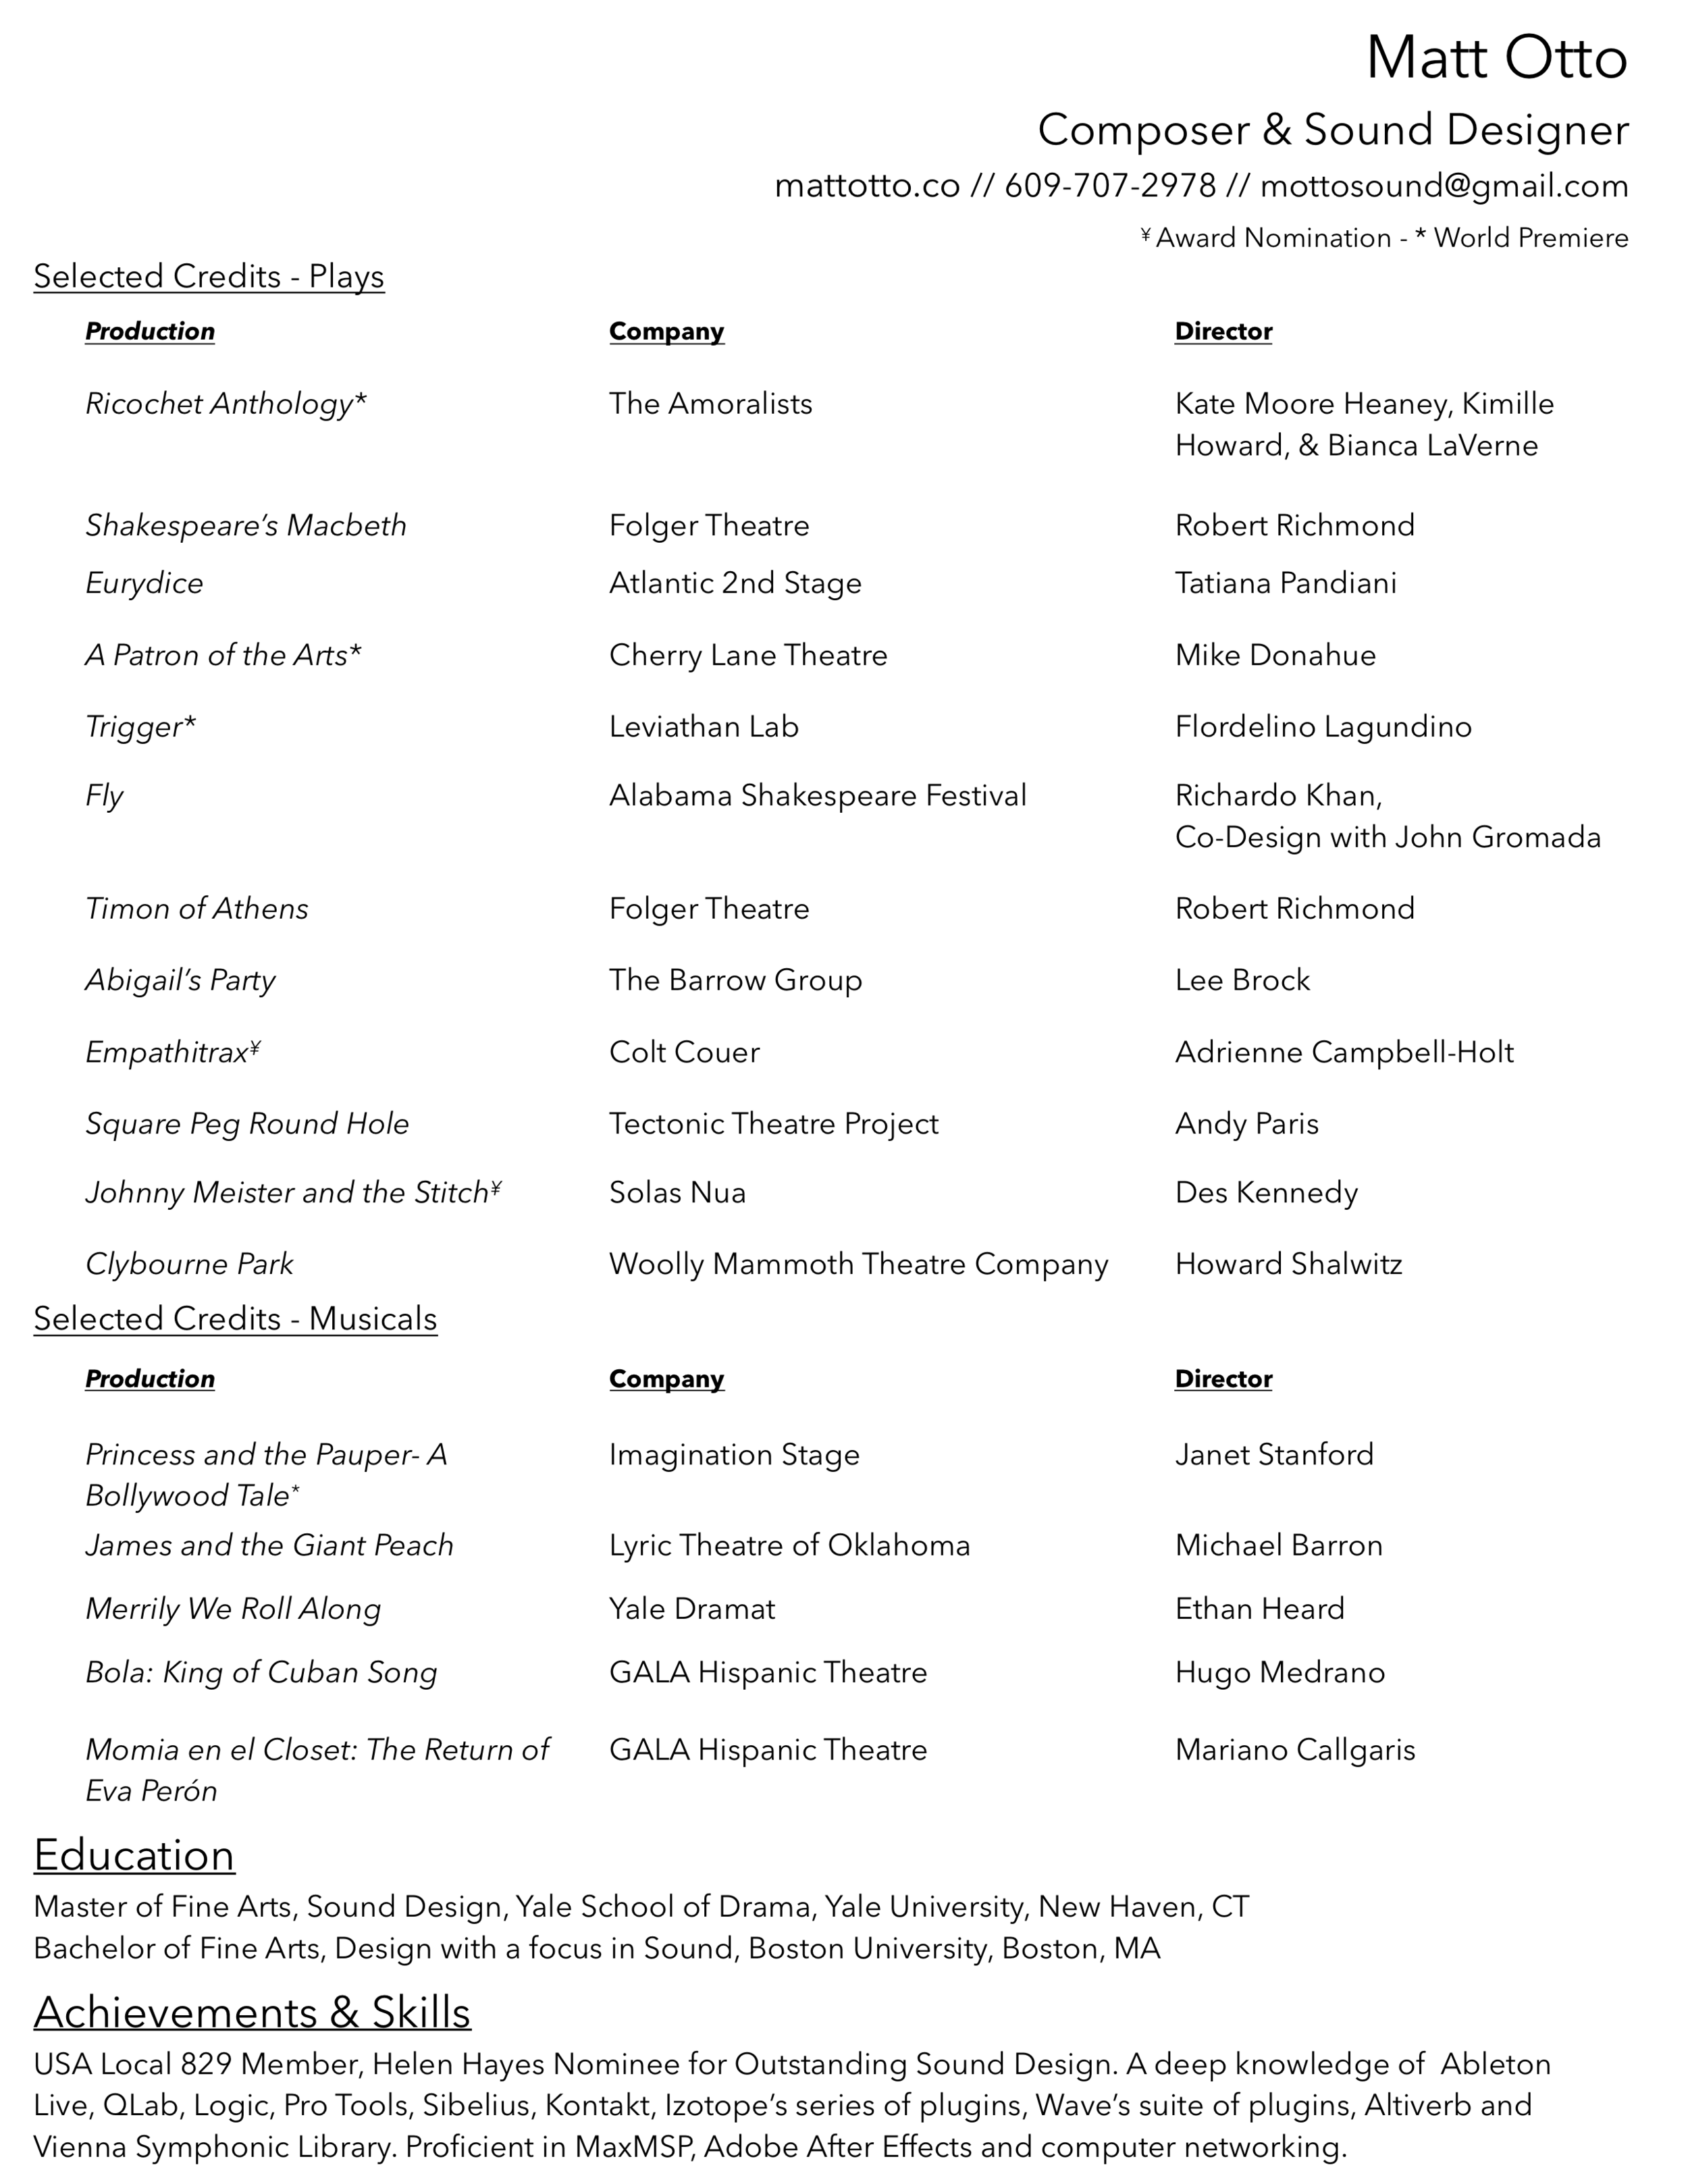 Matt Otto Theatre Resume Selected Credits.png